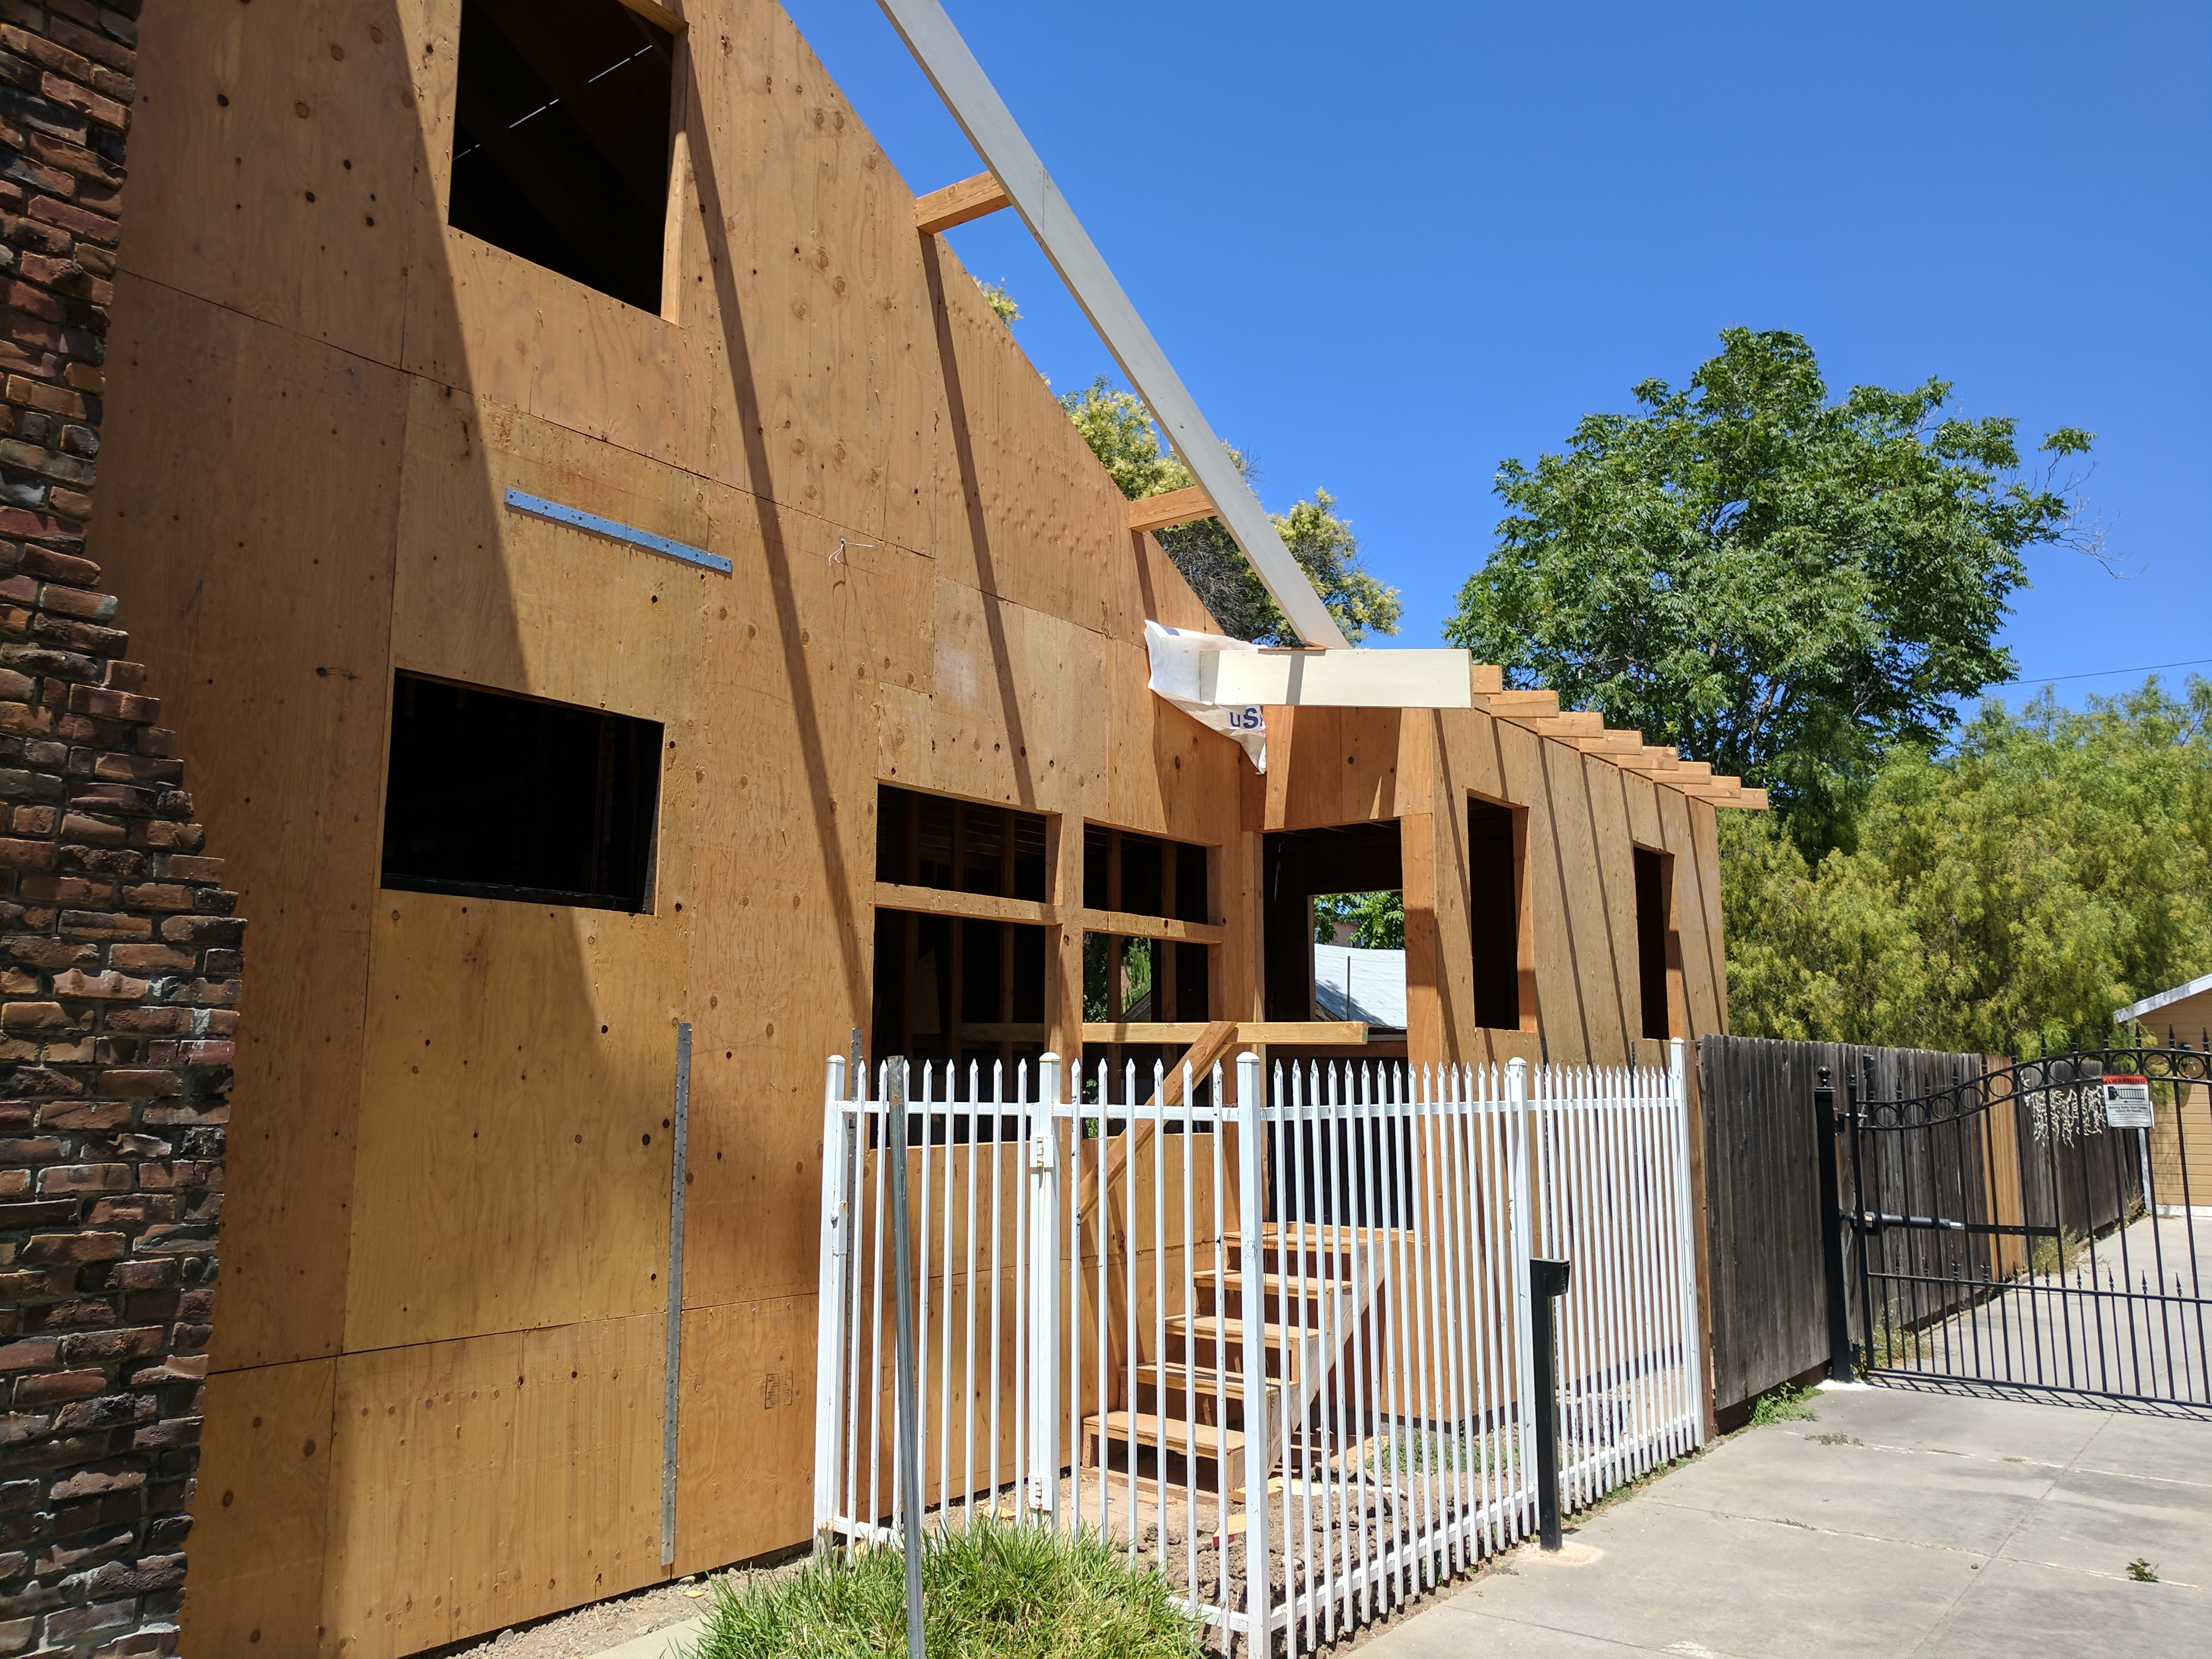 10th Street Construction